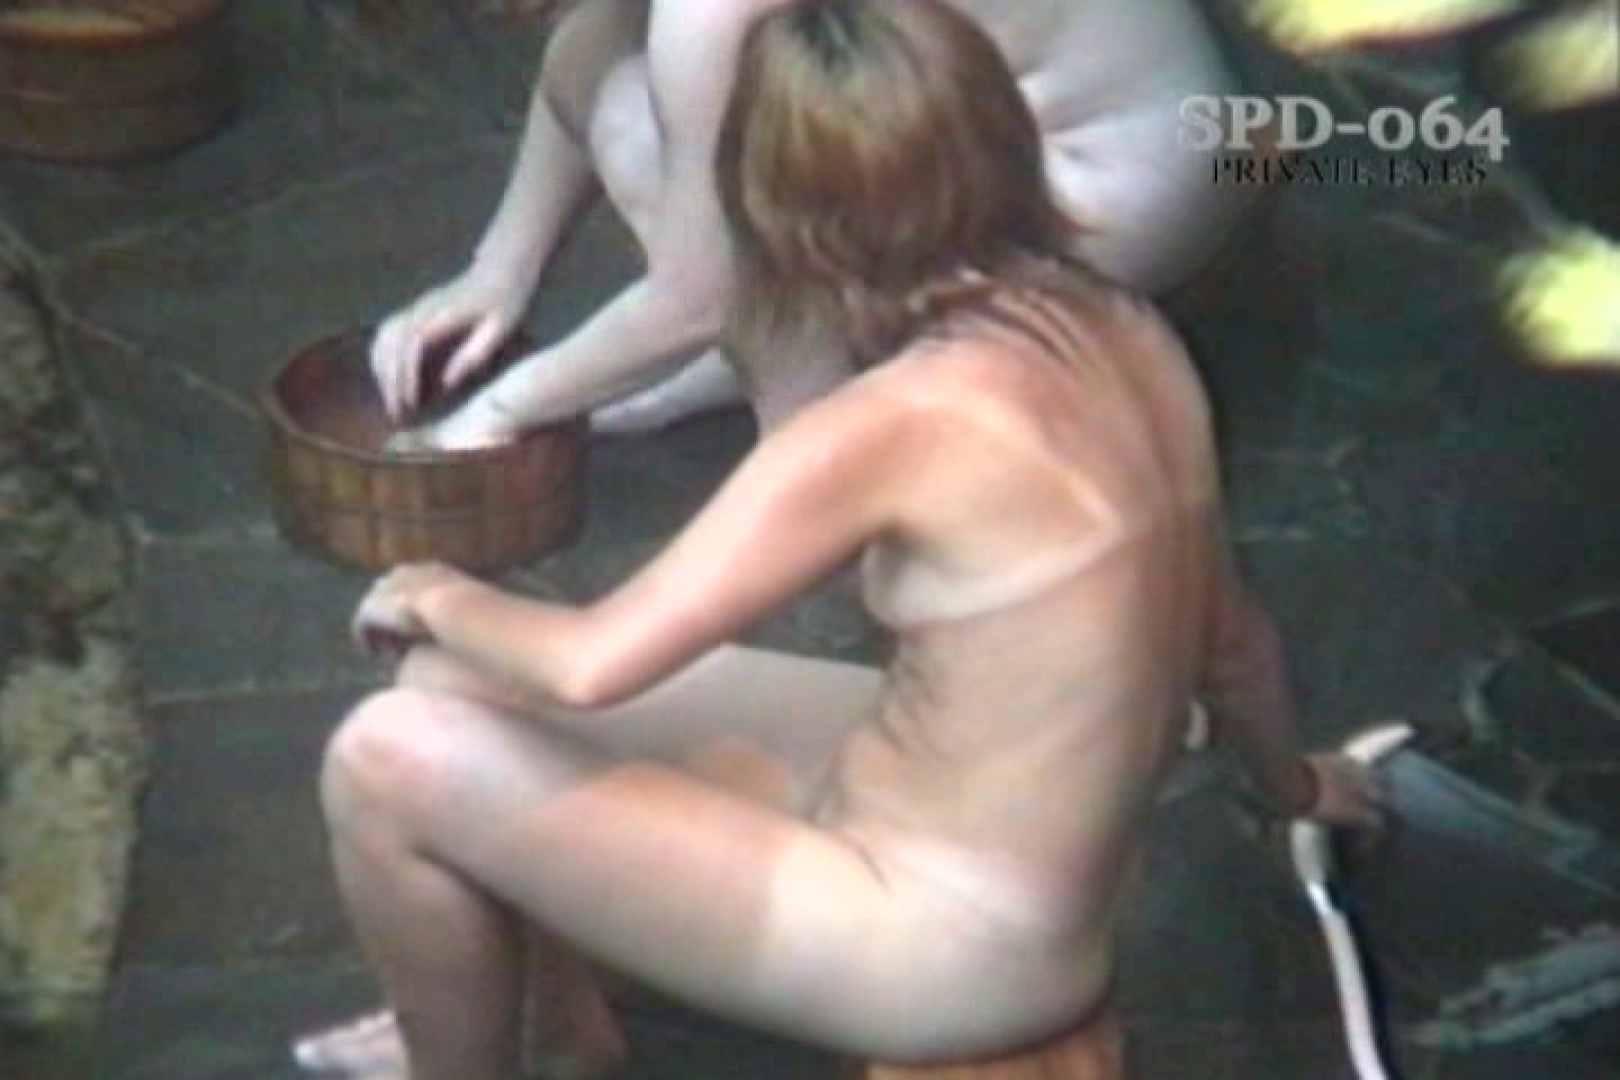 高画質版!SPD-064 盗撮 7 湯乙女の花びら 乙女   盗撮師作品  94pic 66